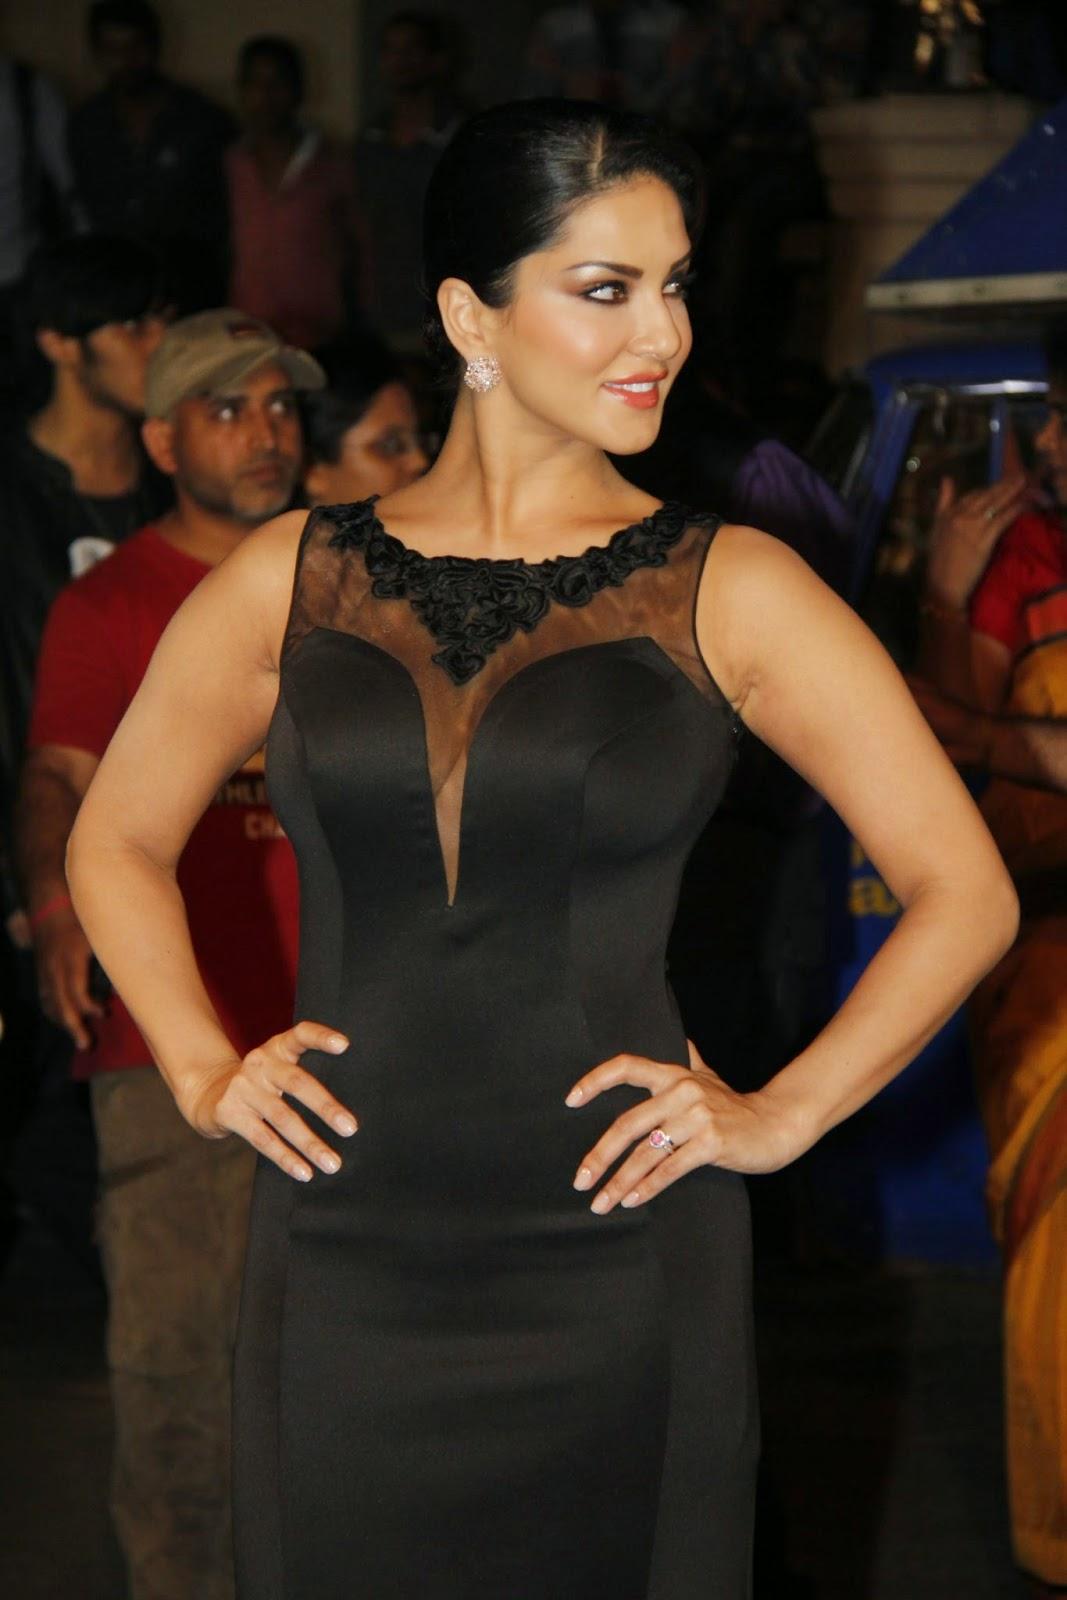 Sunny leone Hot Photos In Long Black Dress